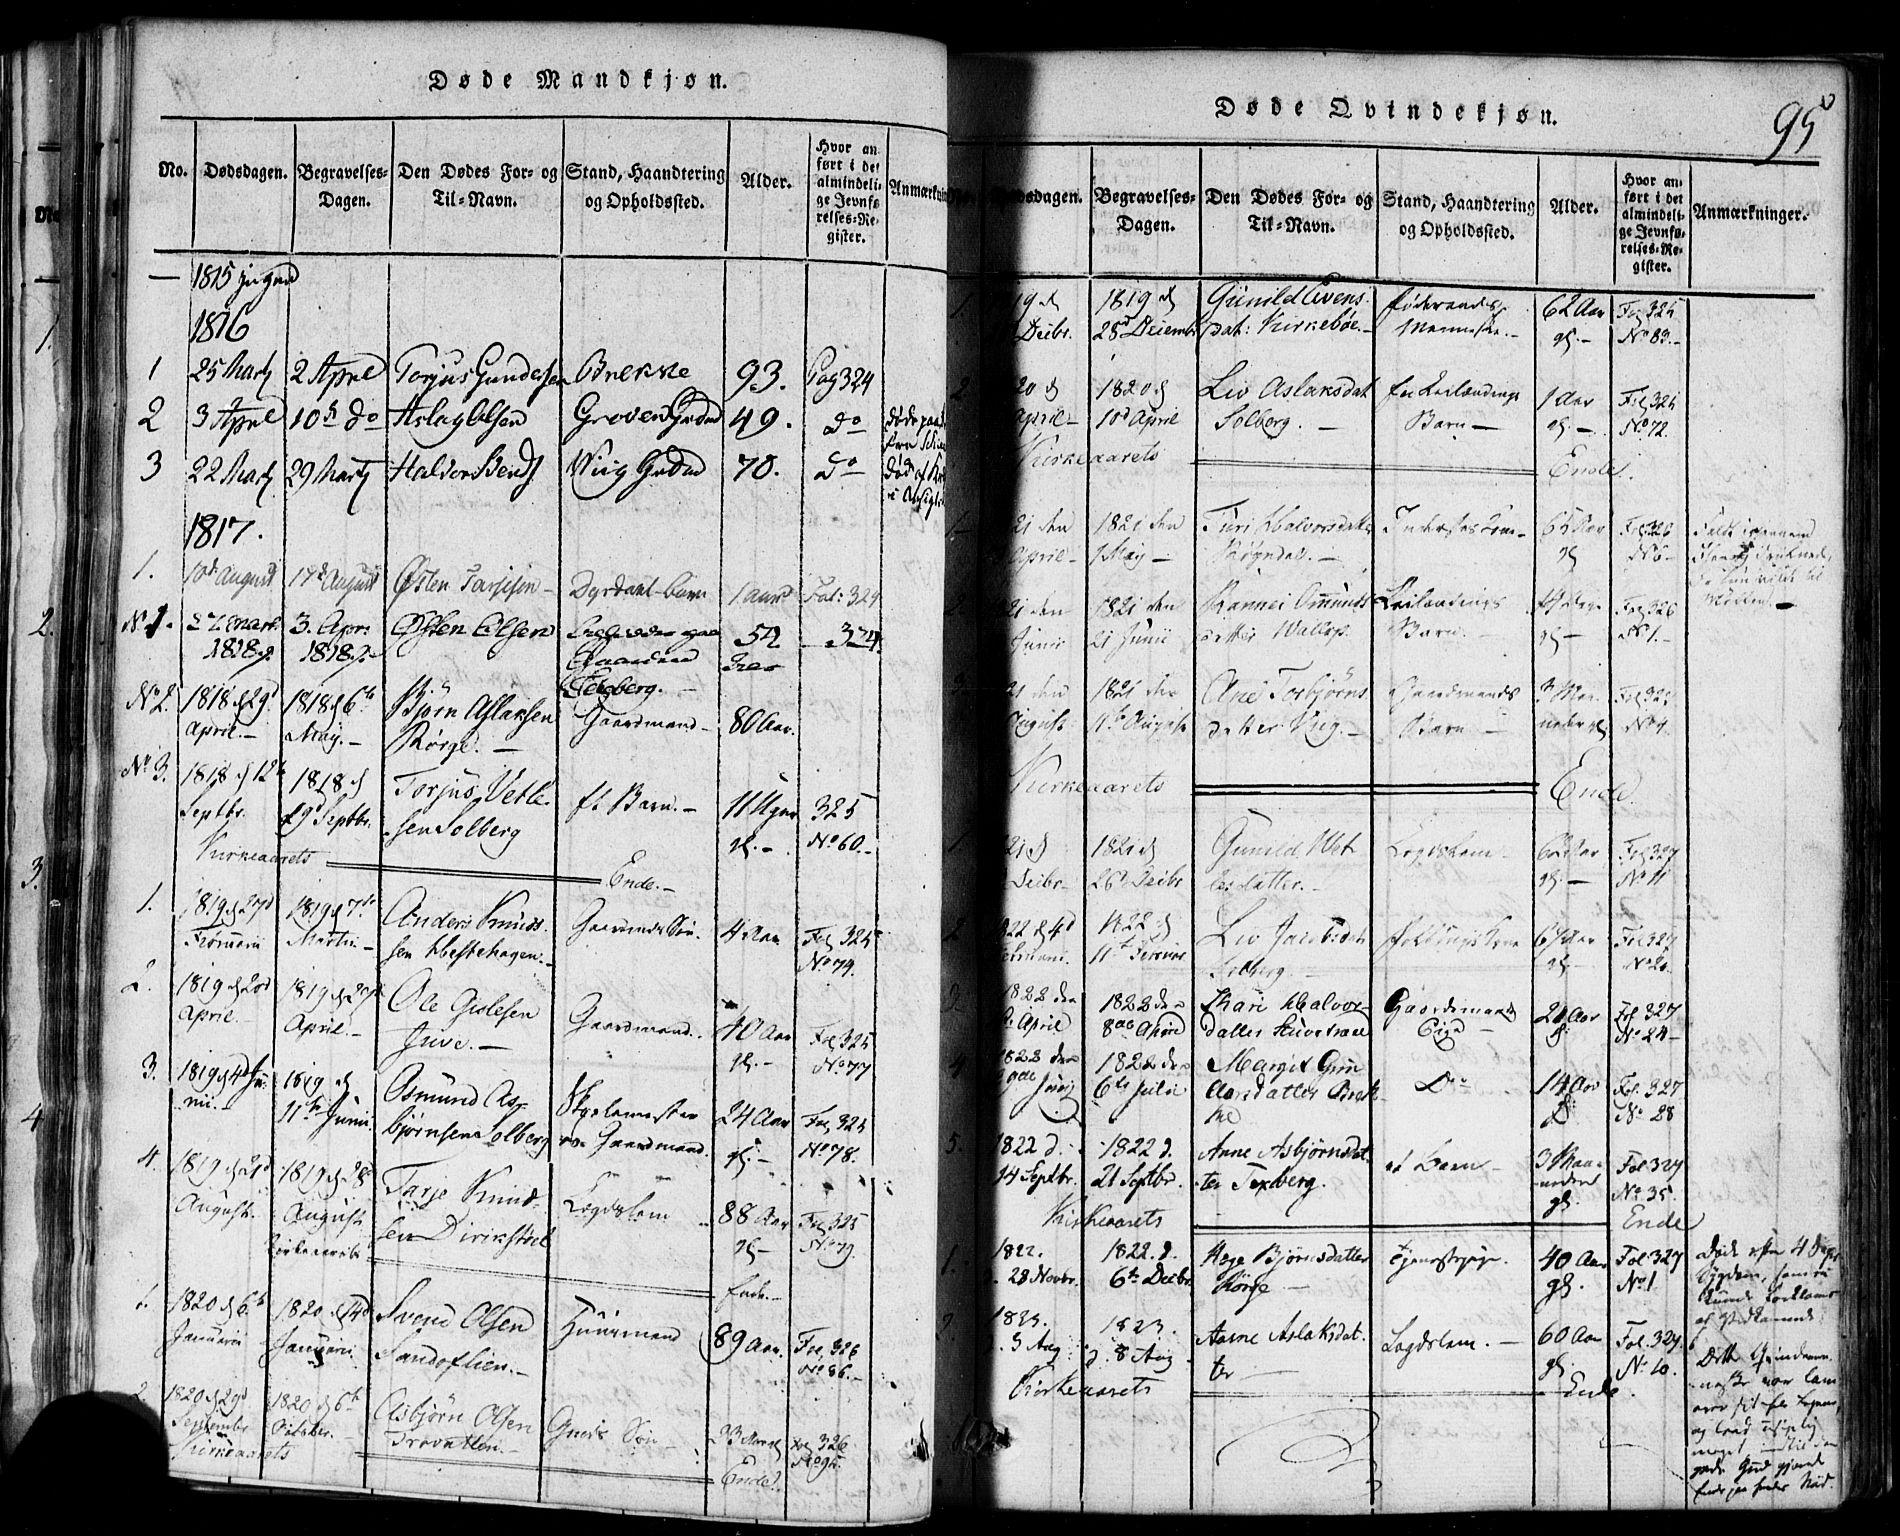 SAKO, Rauland kirkebøker, F/Fa/L0002: Ministerialbok nr. 2, 1815-1860, s. 95